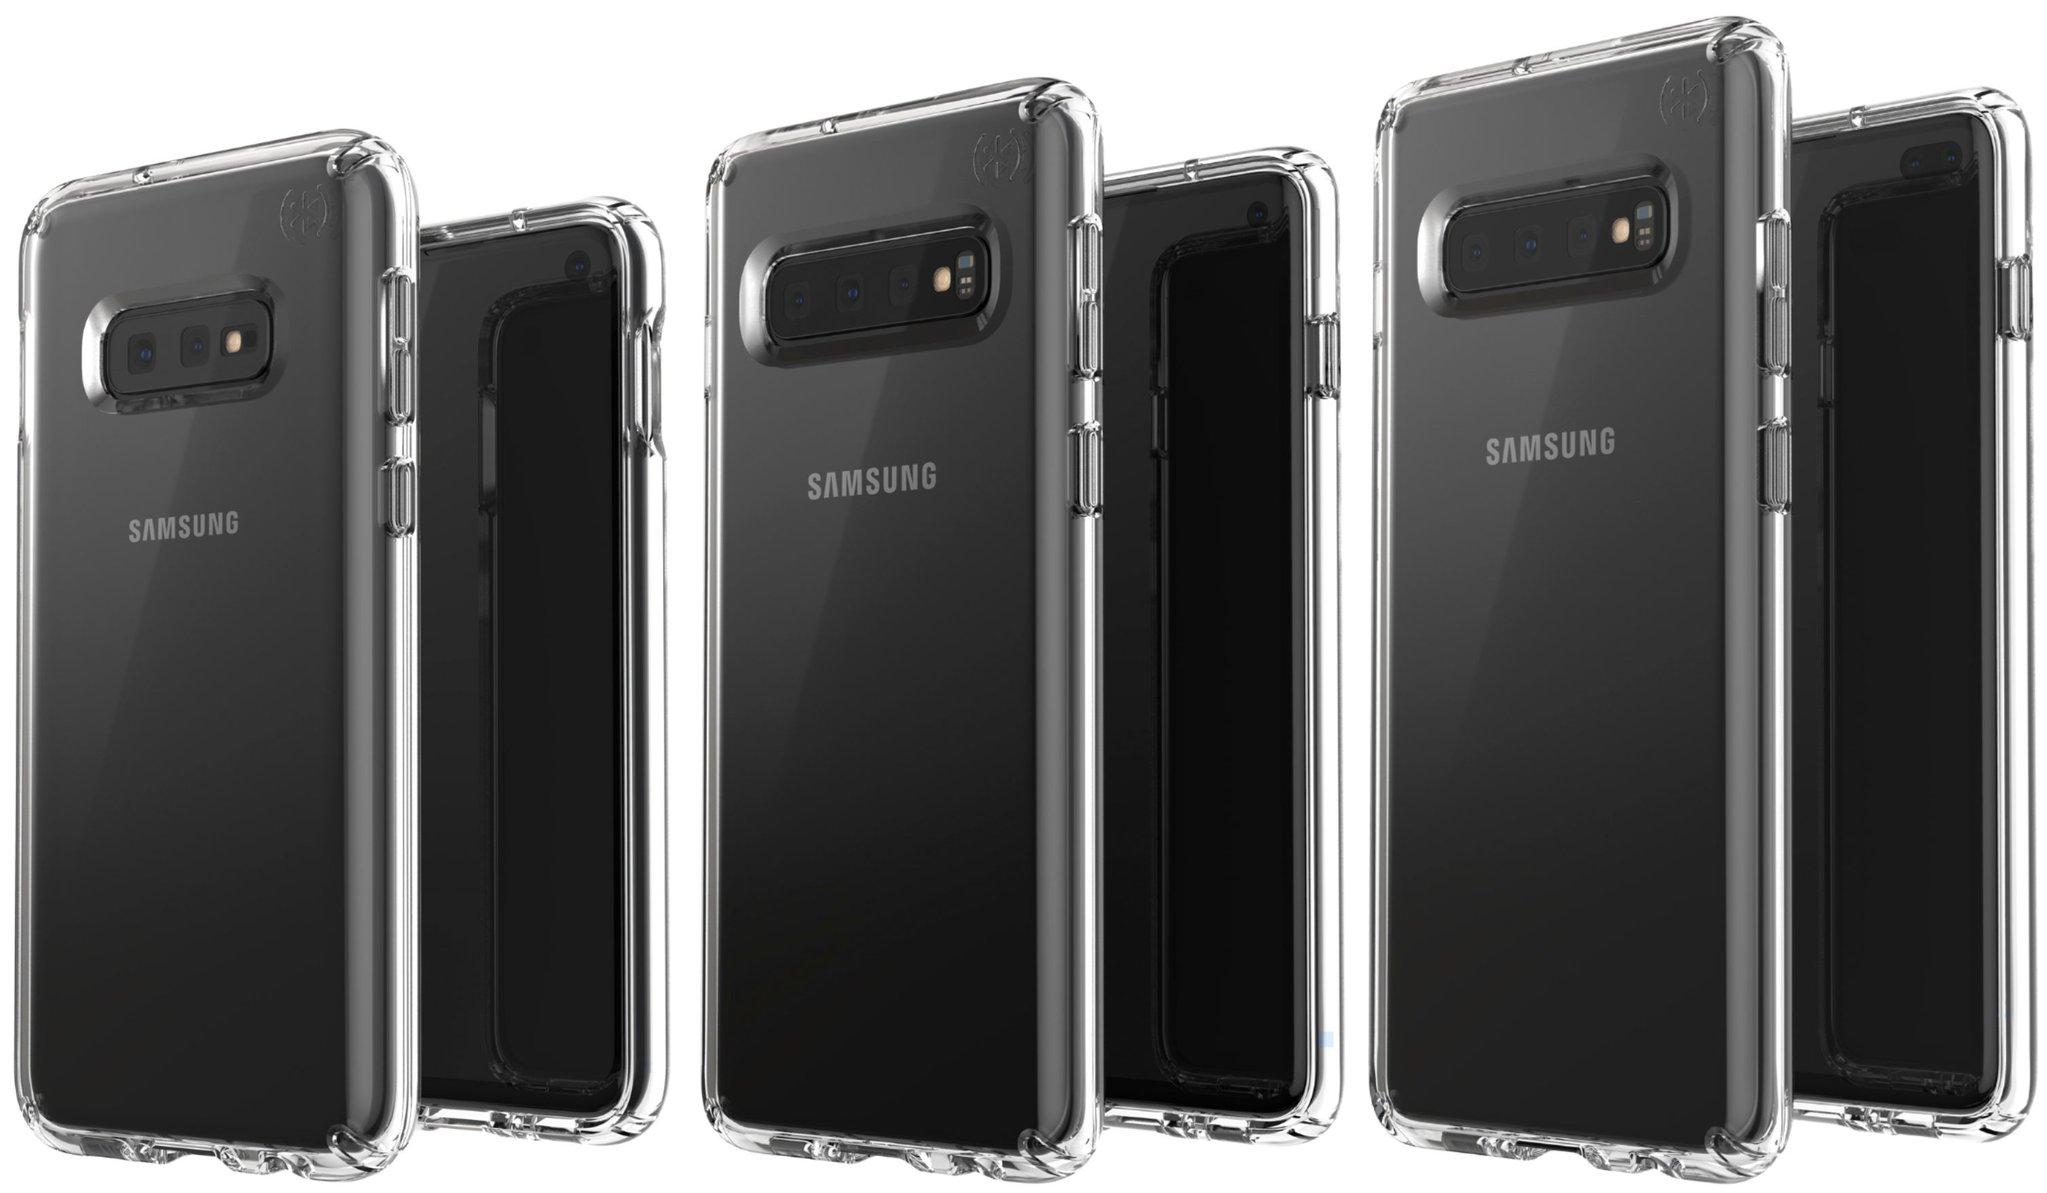 Samsung GALAXY S10 foto modele